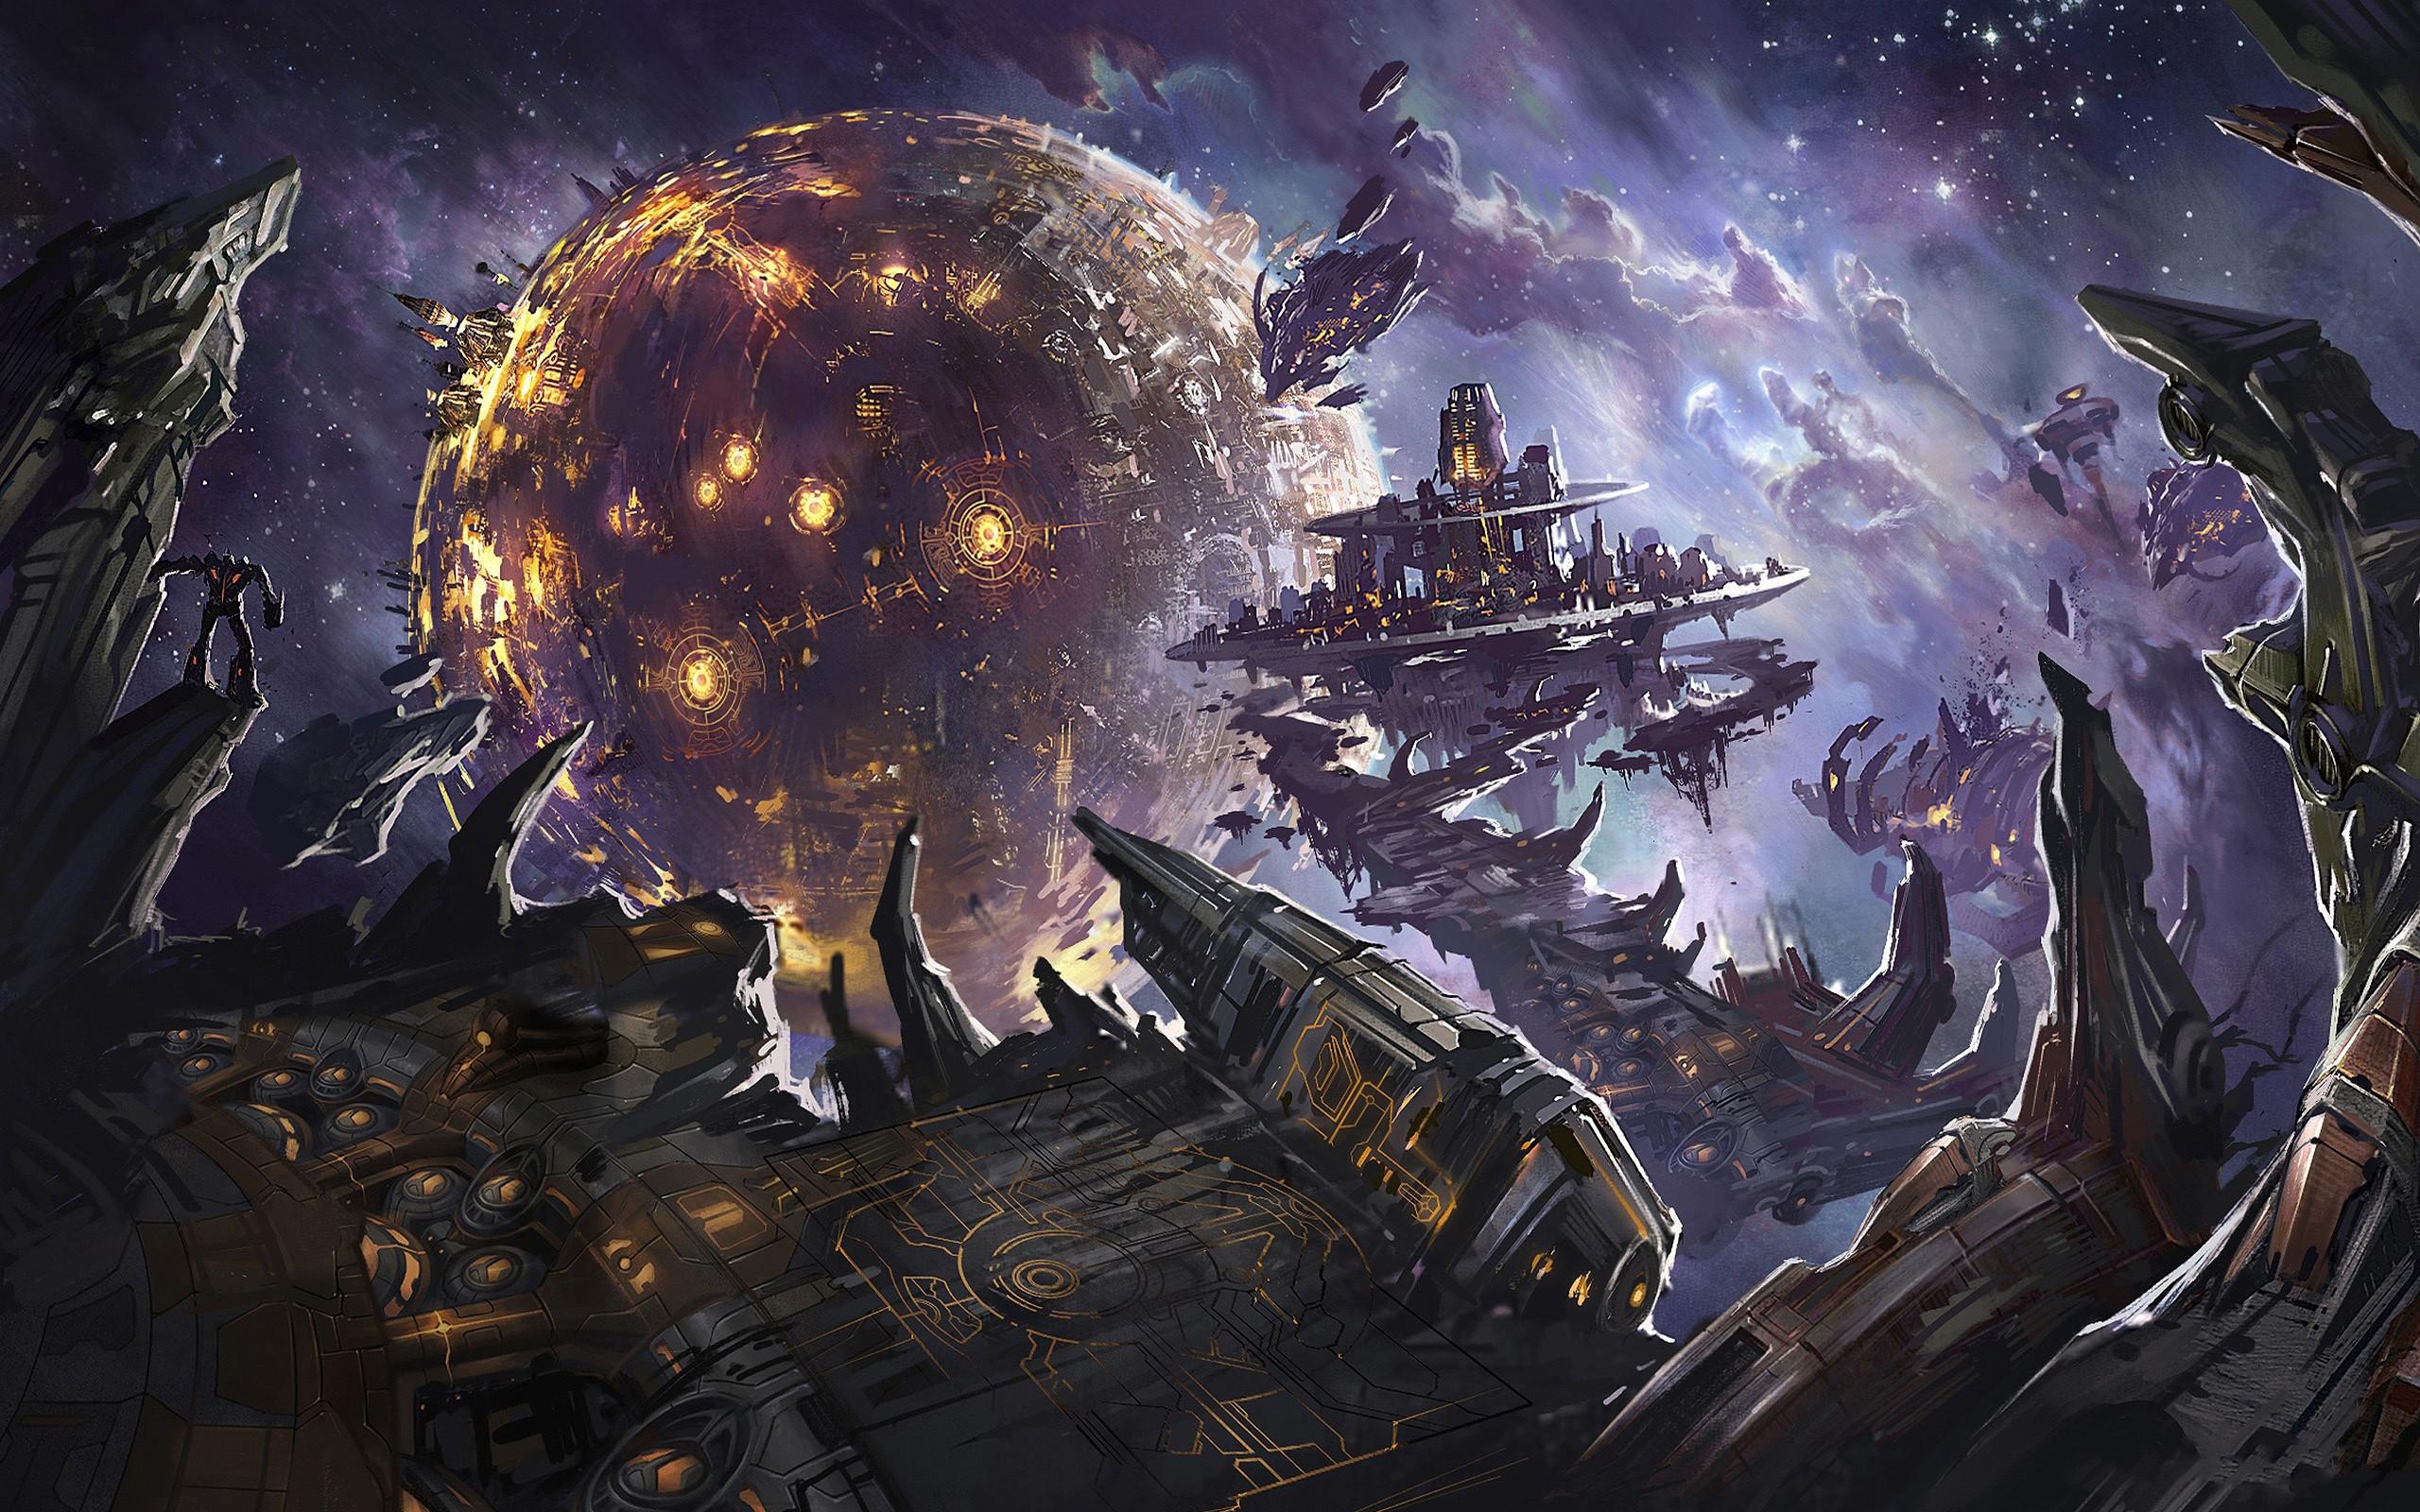 Transformers War for Cybertron Wallpaper Background | 39775